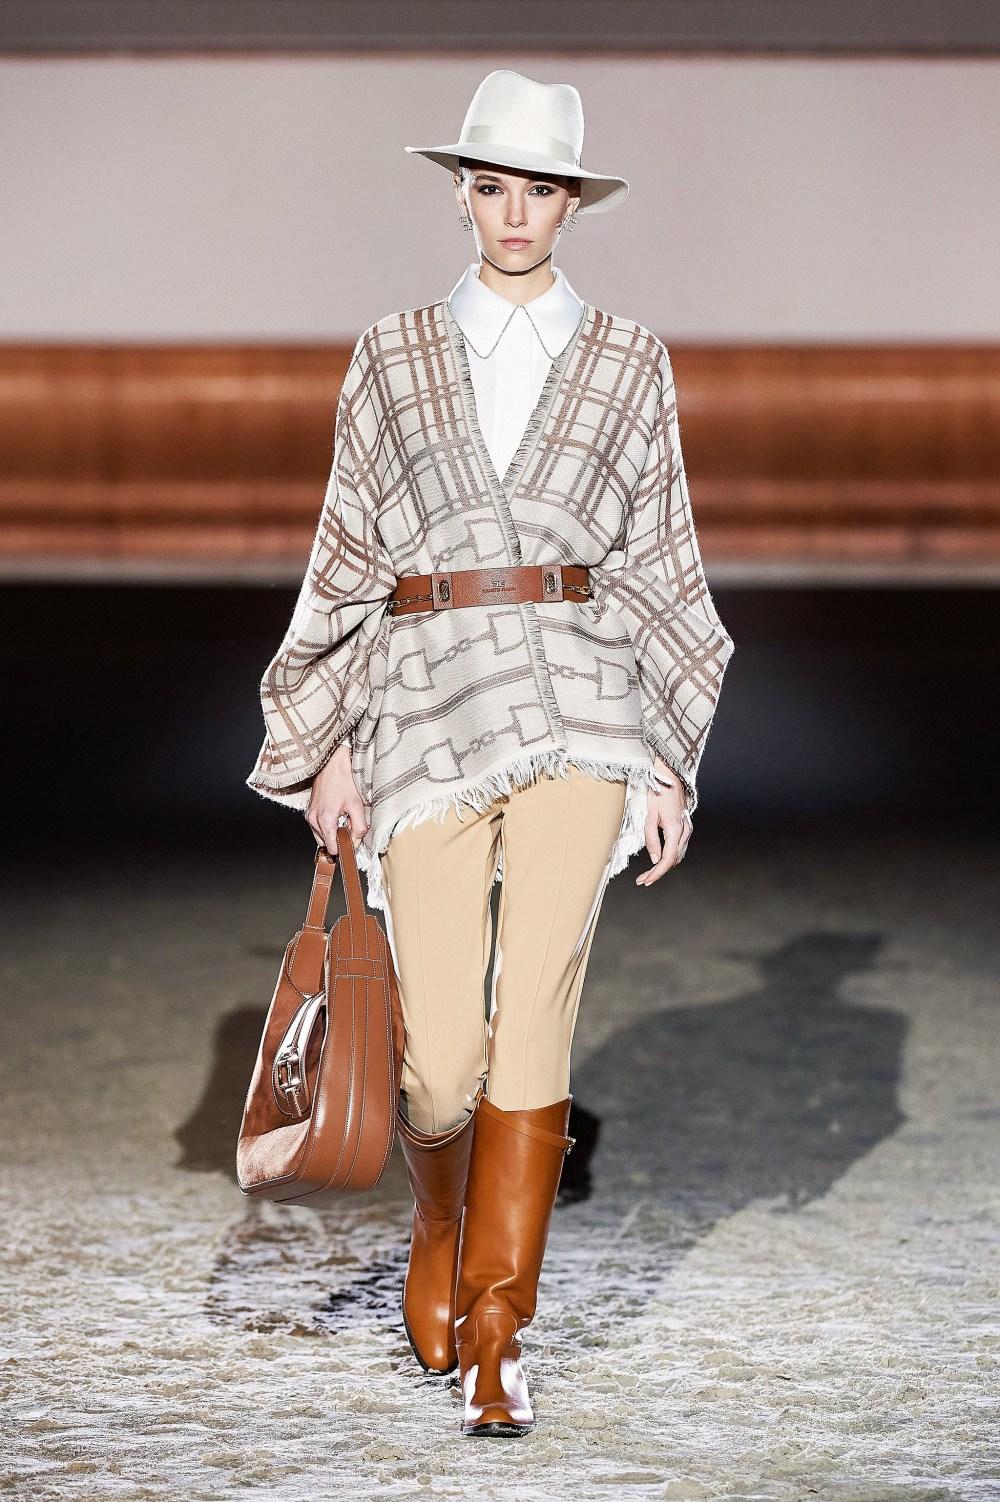 Elisabetta Franchi: Elisabetta Franchi Fall Winter 2021-22 Fashion Show Photo #2